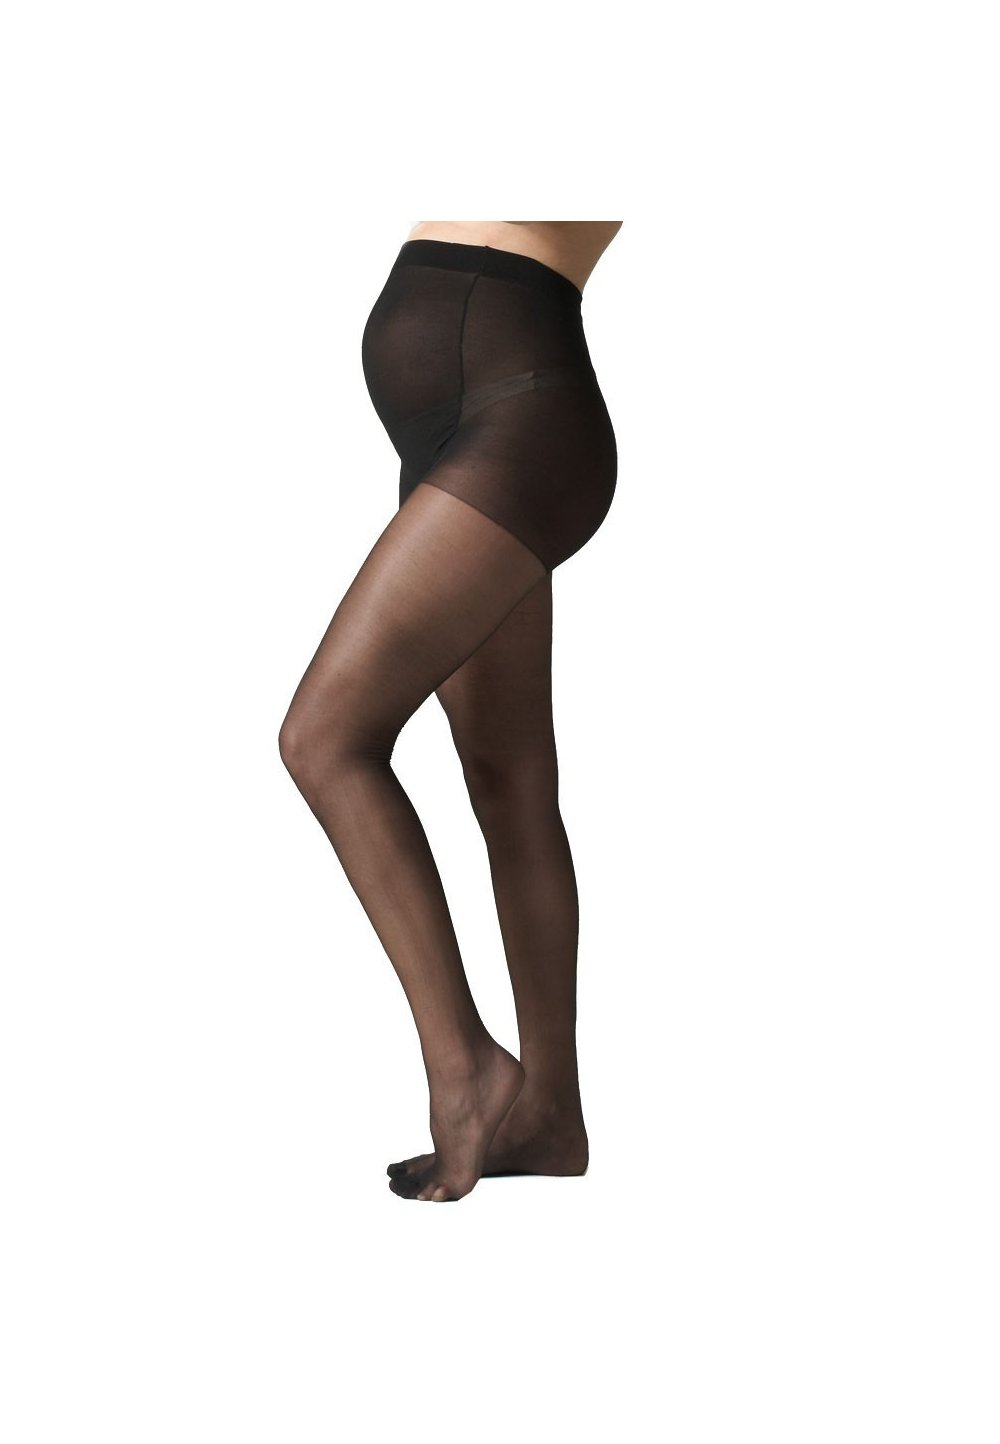 Ciorapi cu chilot gravide,negri, 20 Den imagine